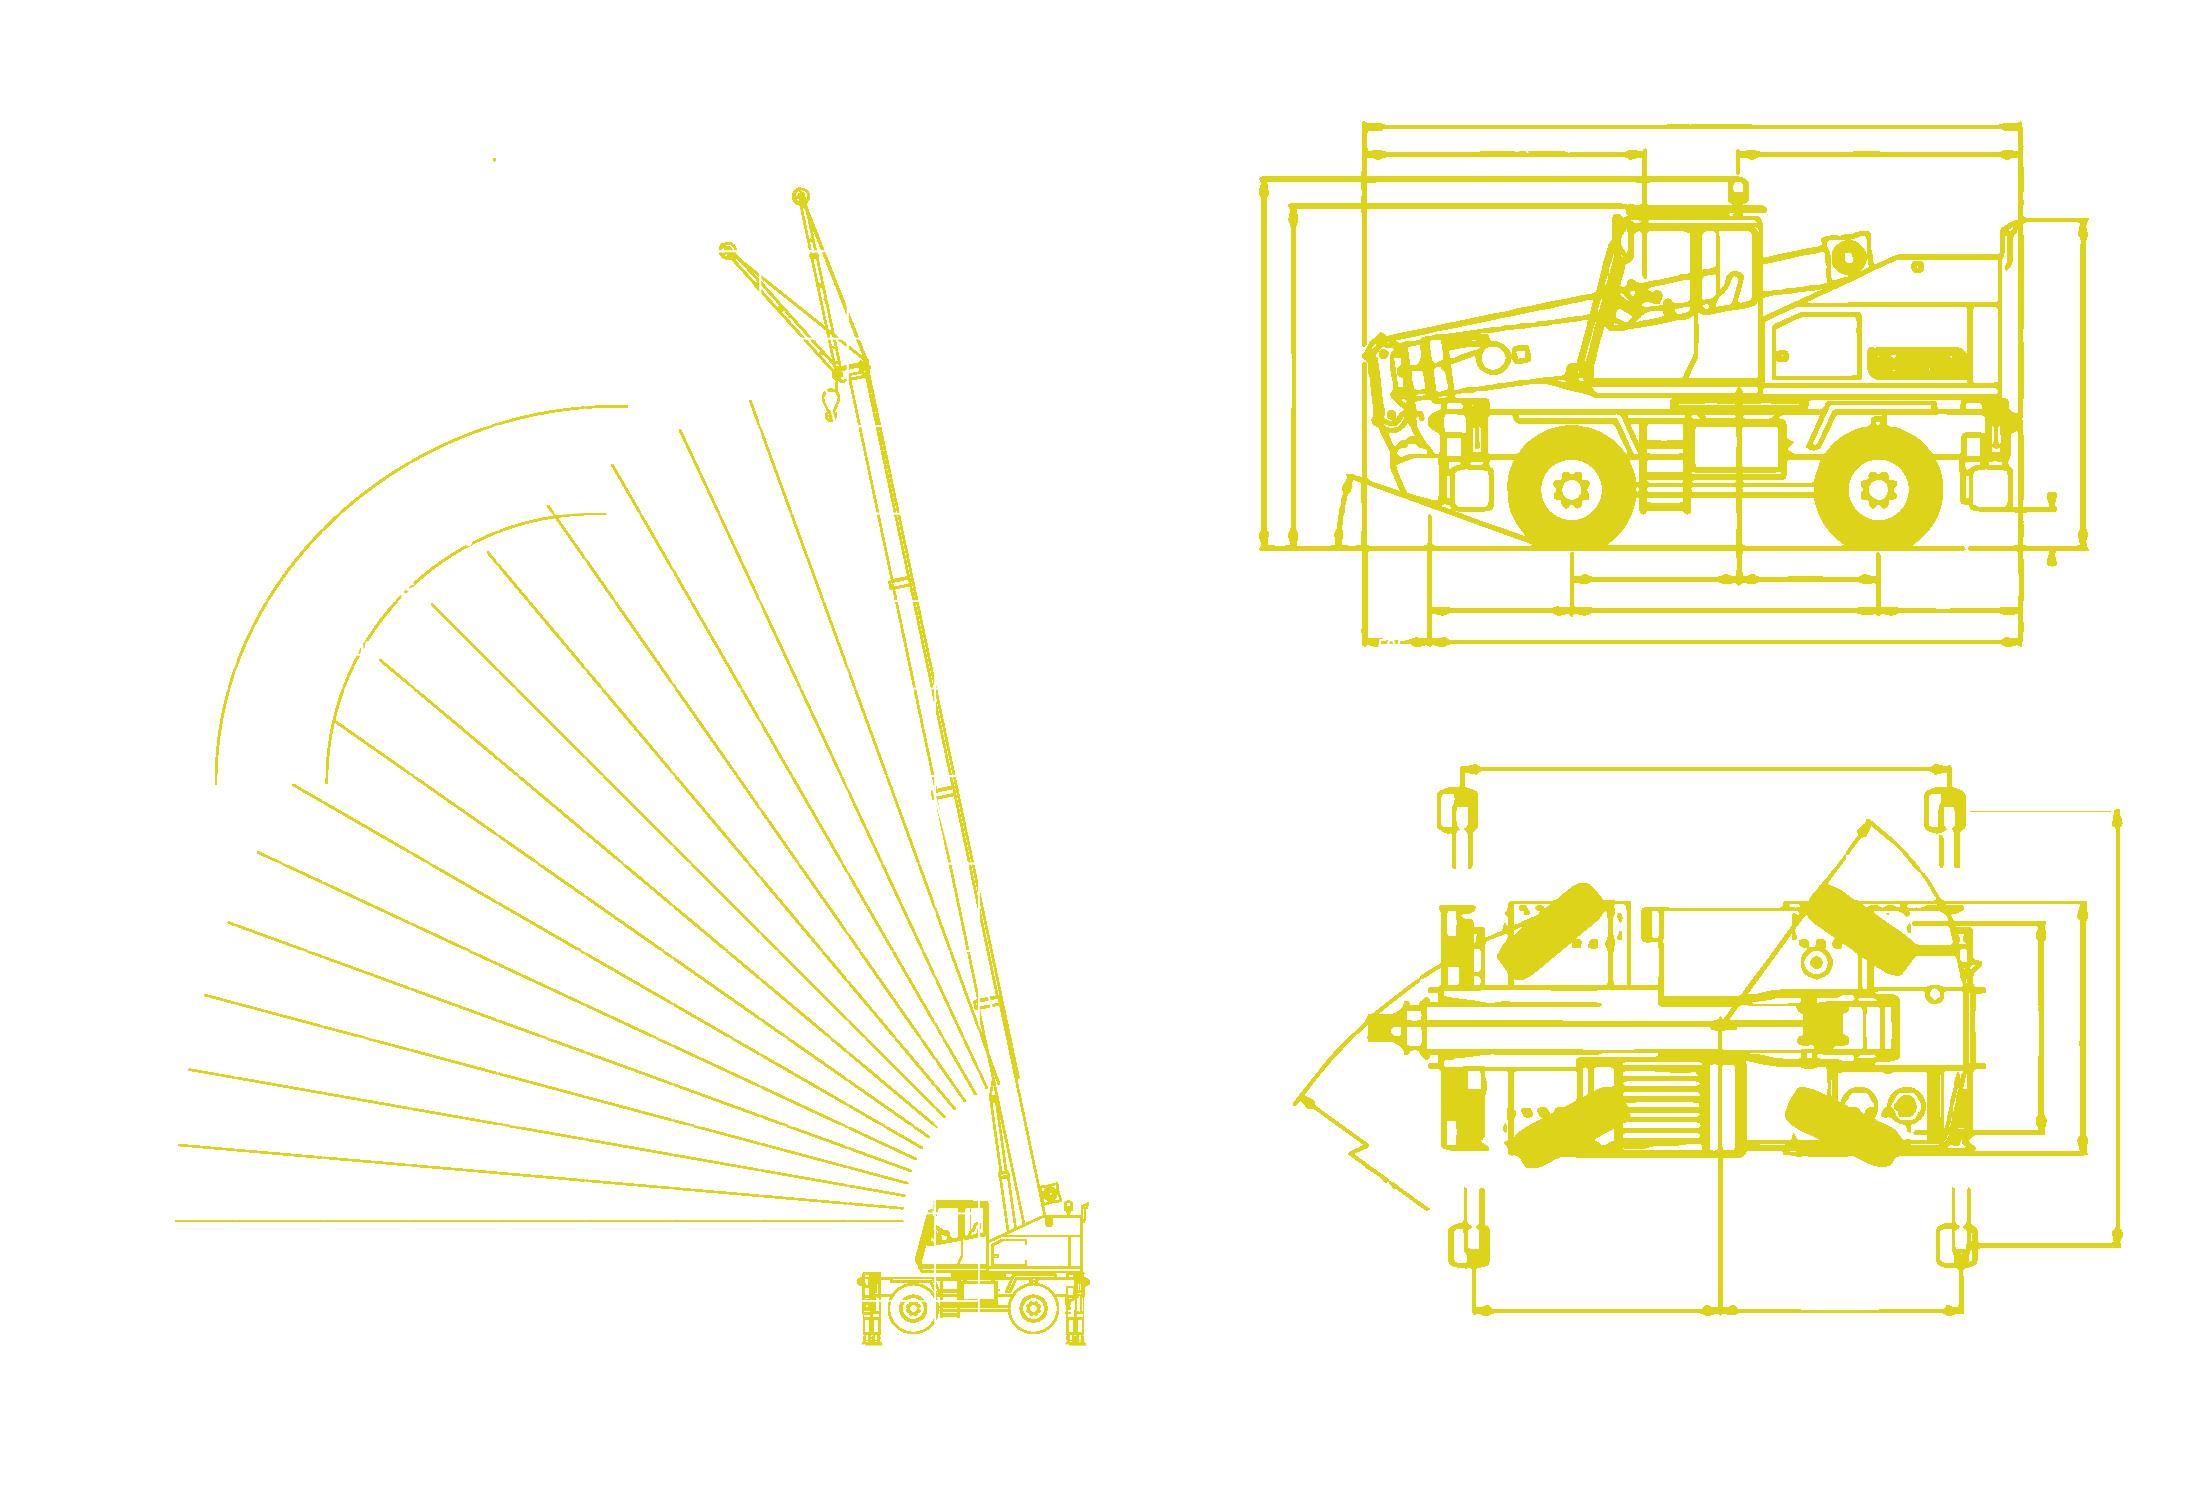 Locatelli - Gril 13.12 Working Envelope and Machine Diagrams